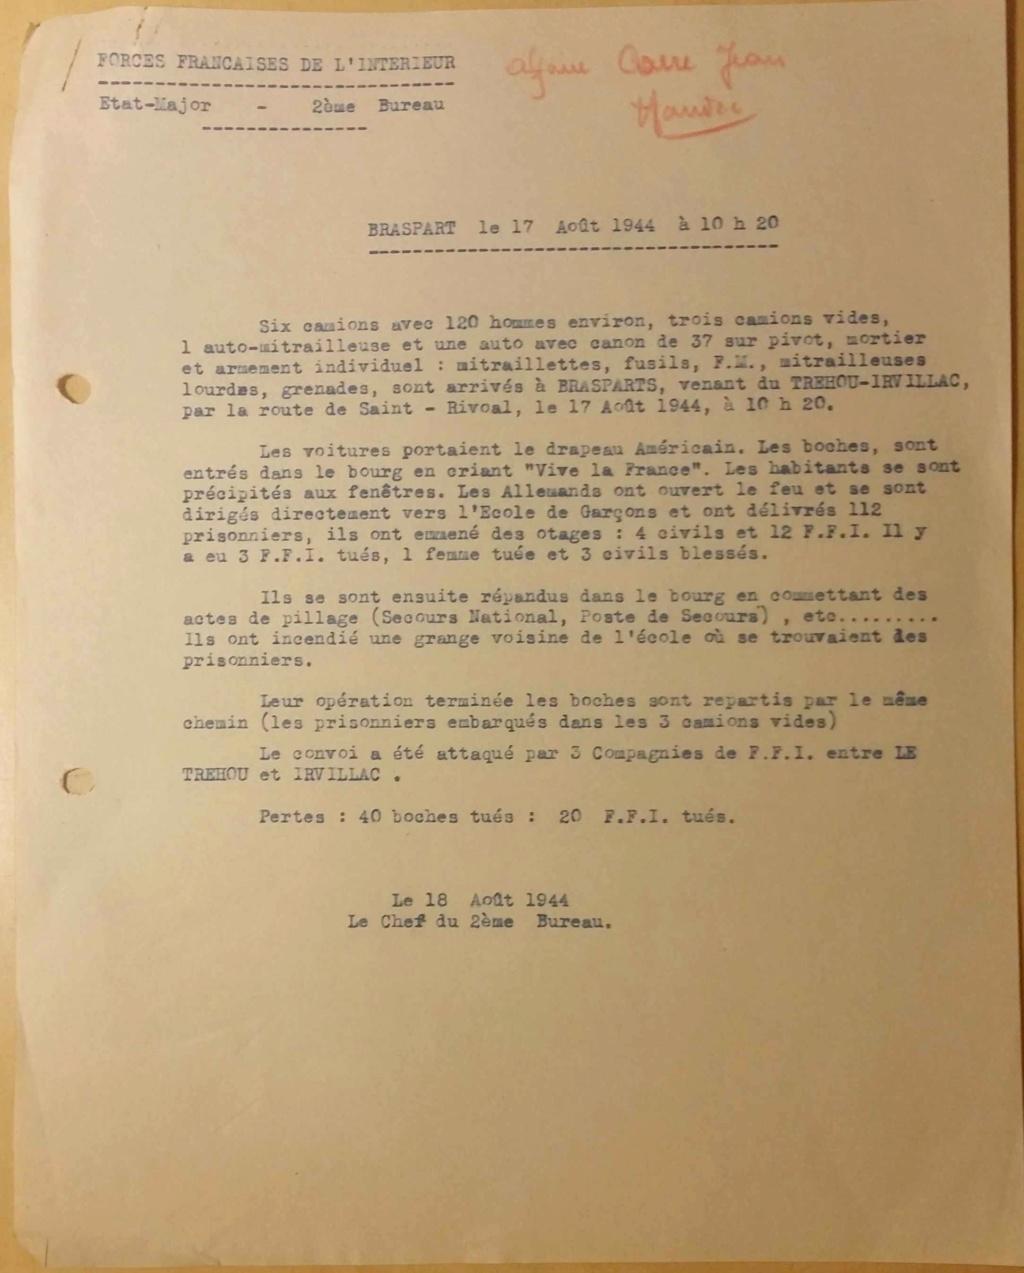 Brasparts, 16 août 1944 4408-211